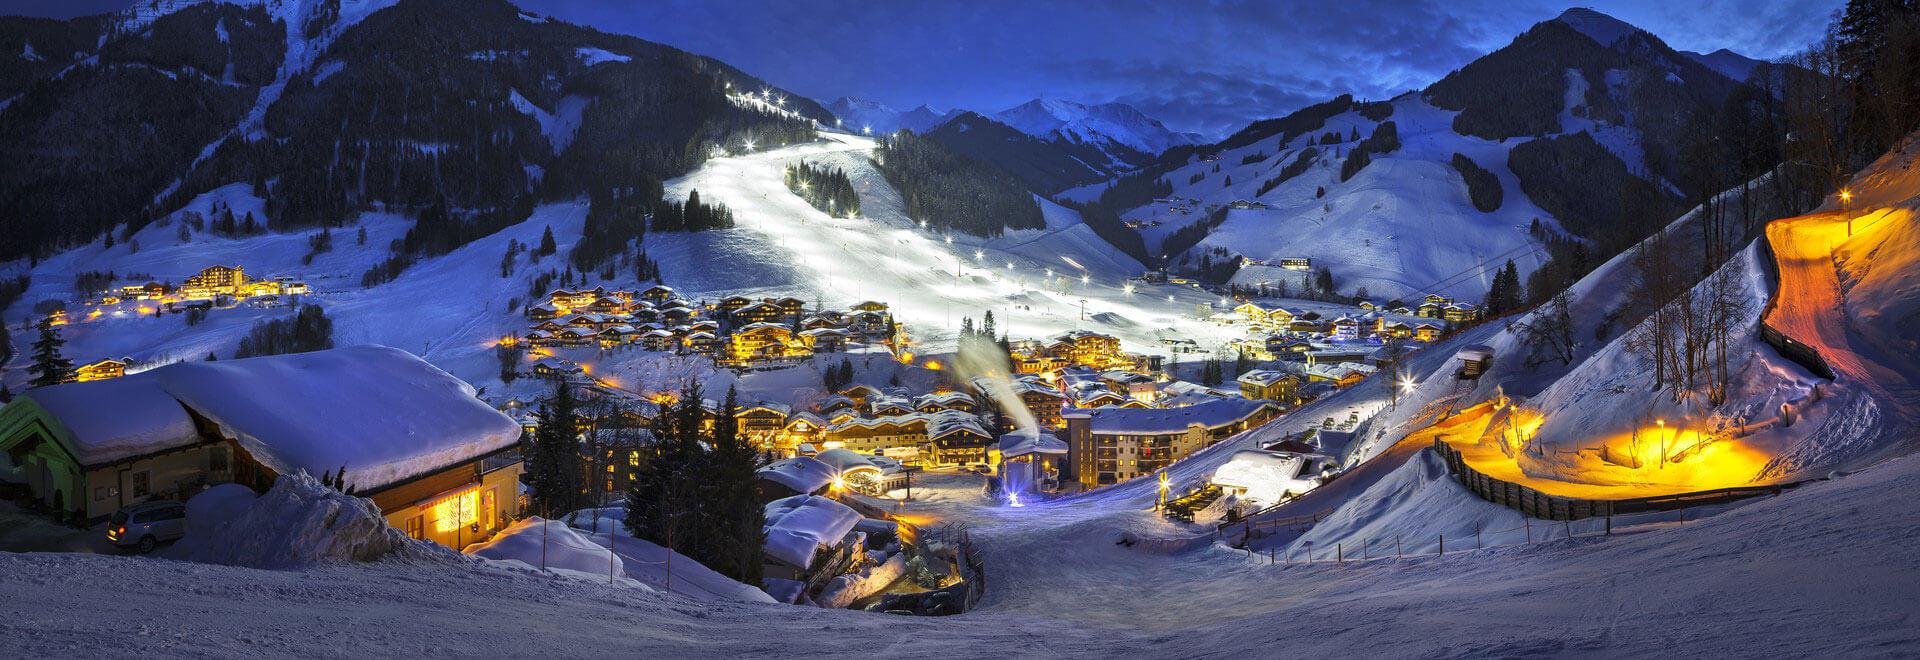 Winter Saalbach Hinterglemm